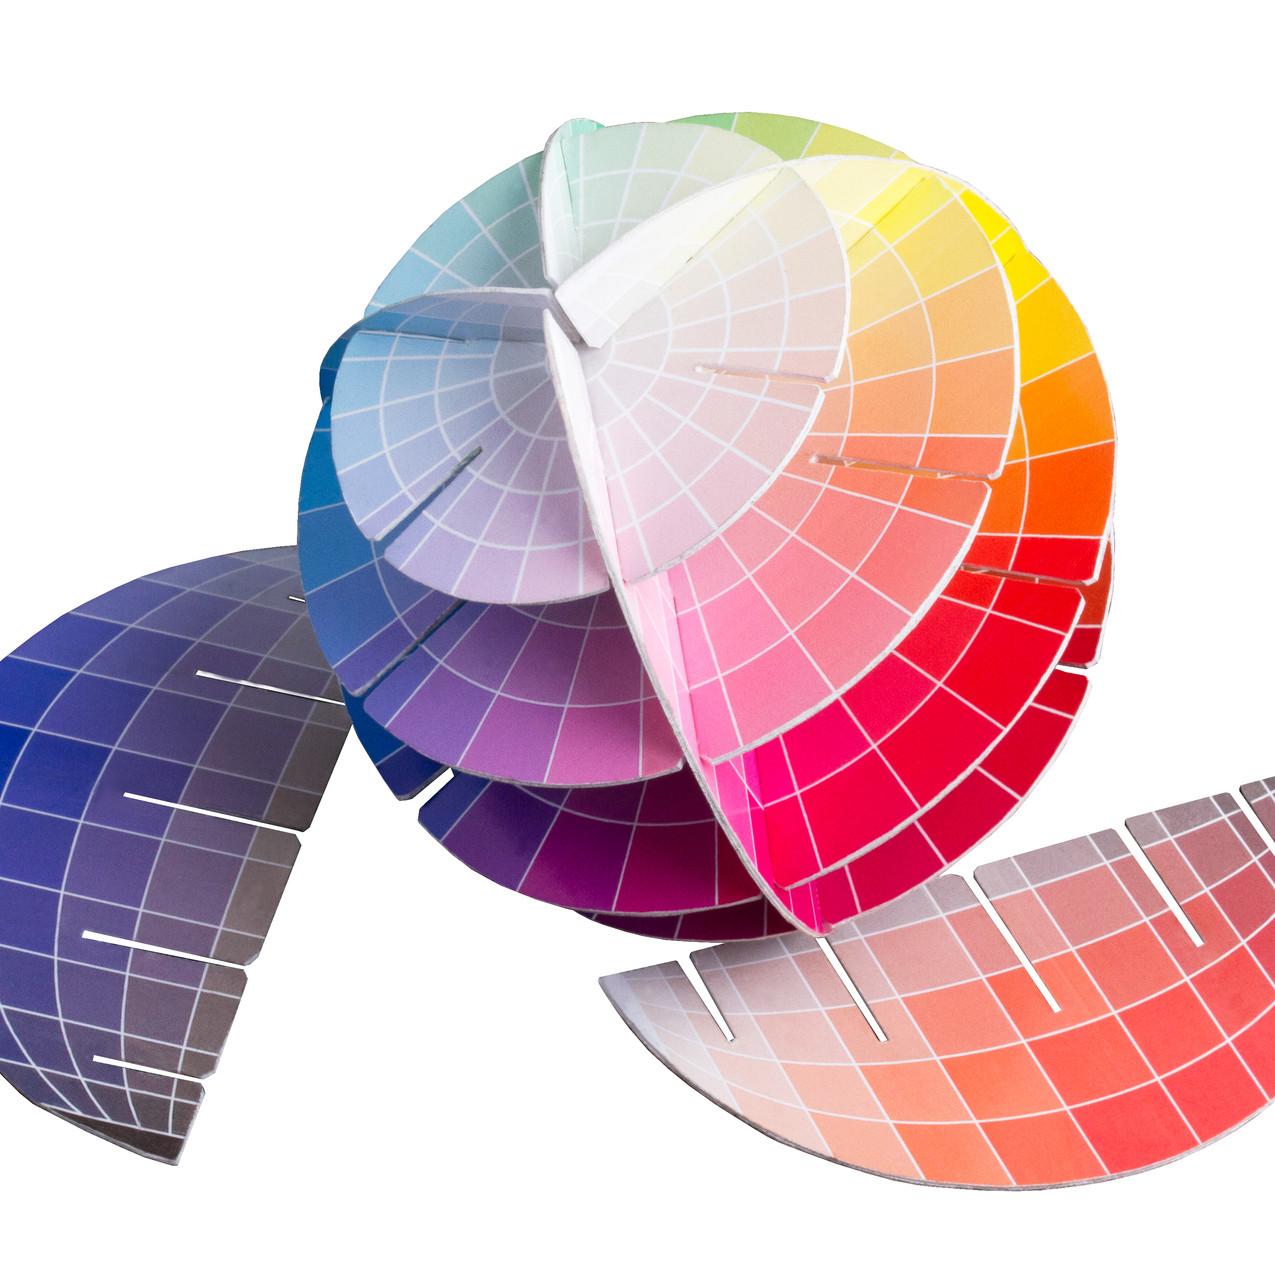 MINI-Colour-Globe-high-white-background